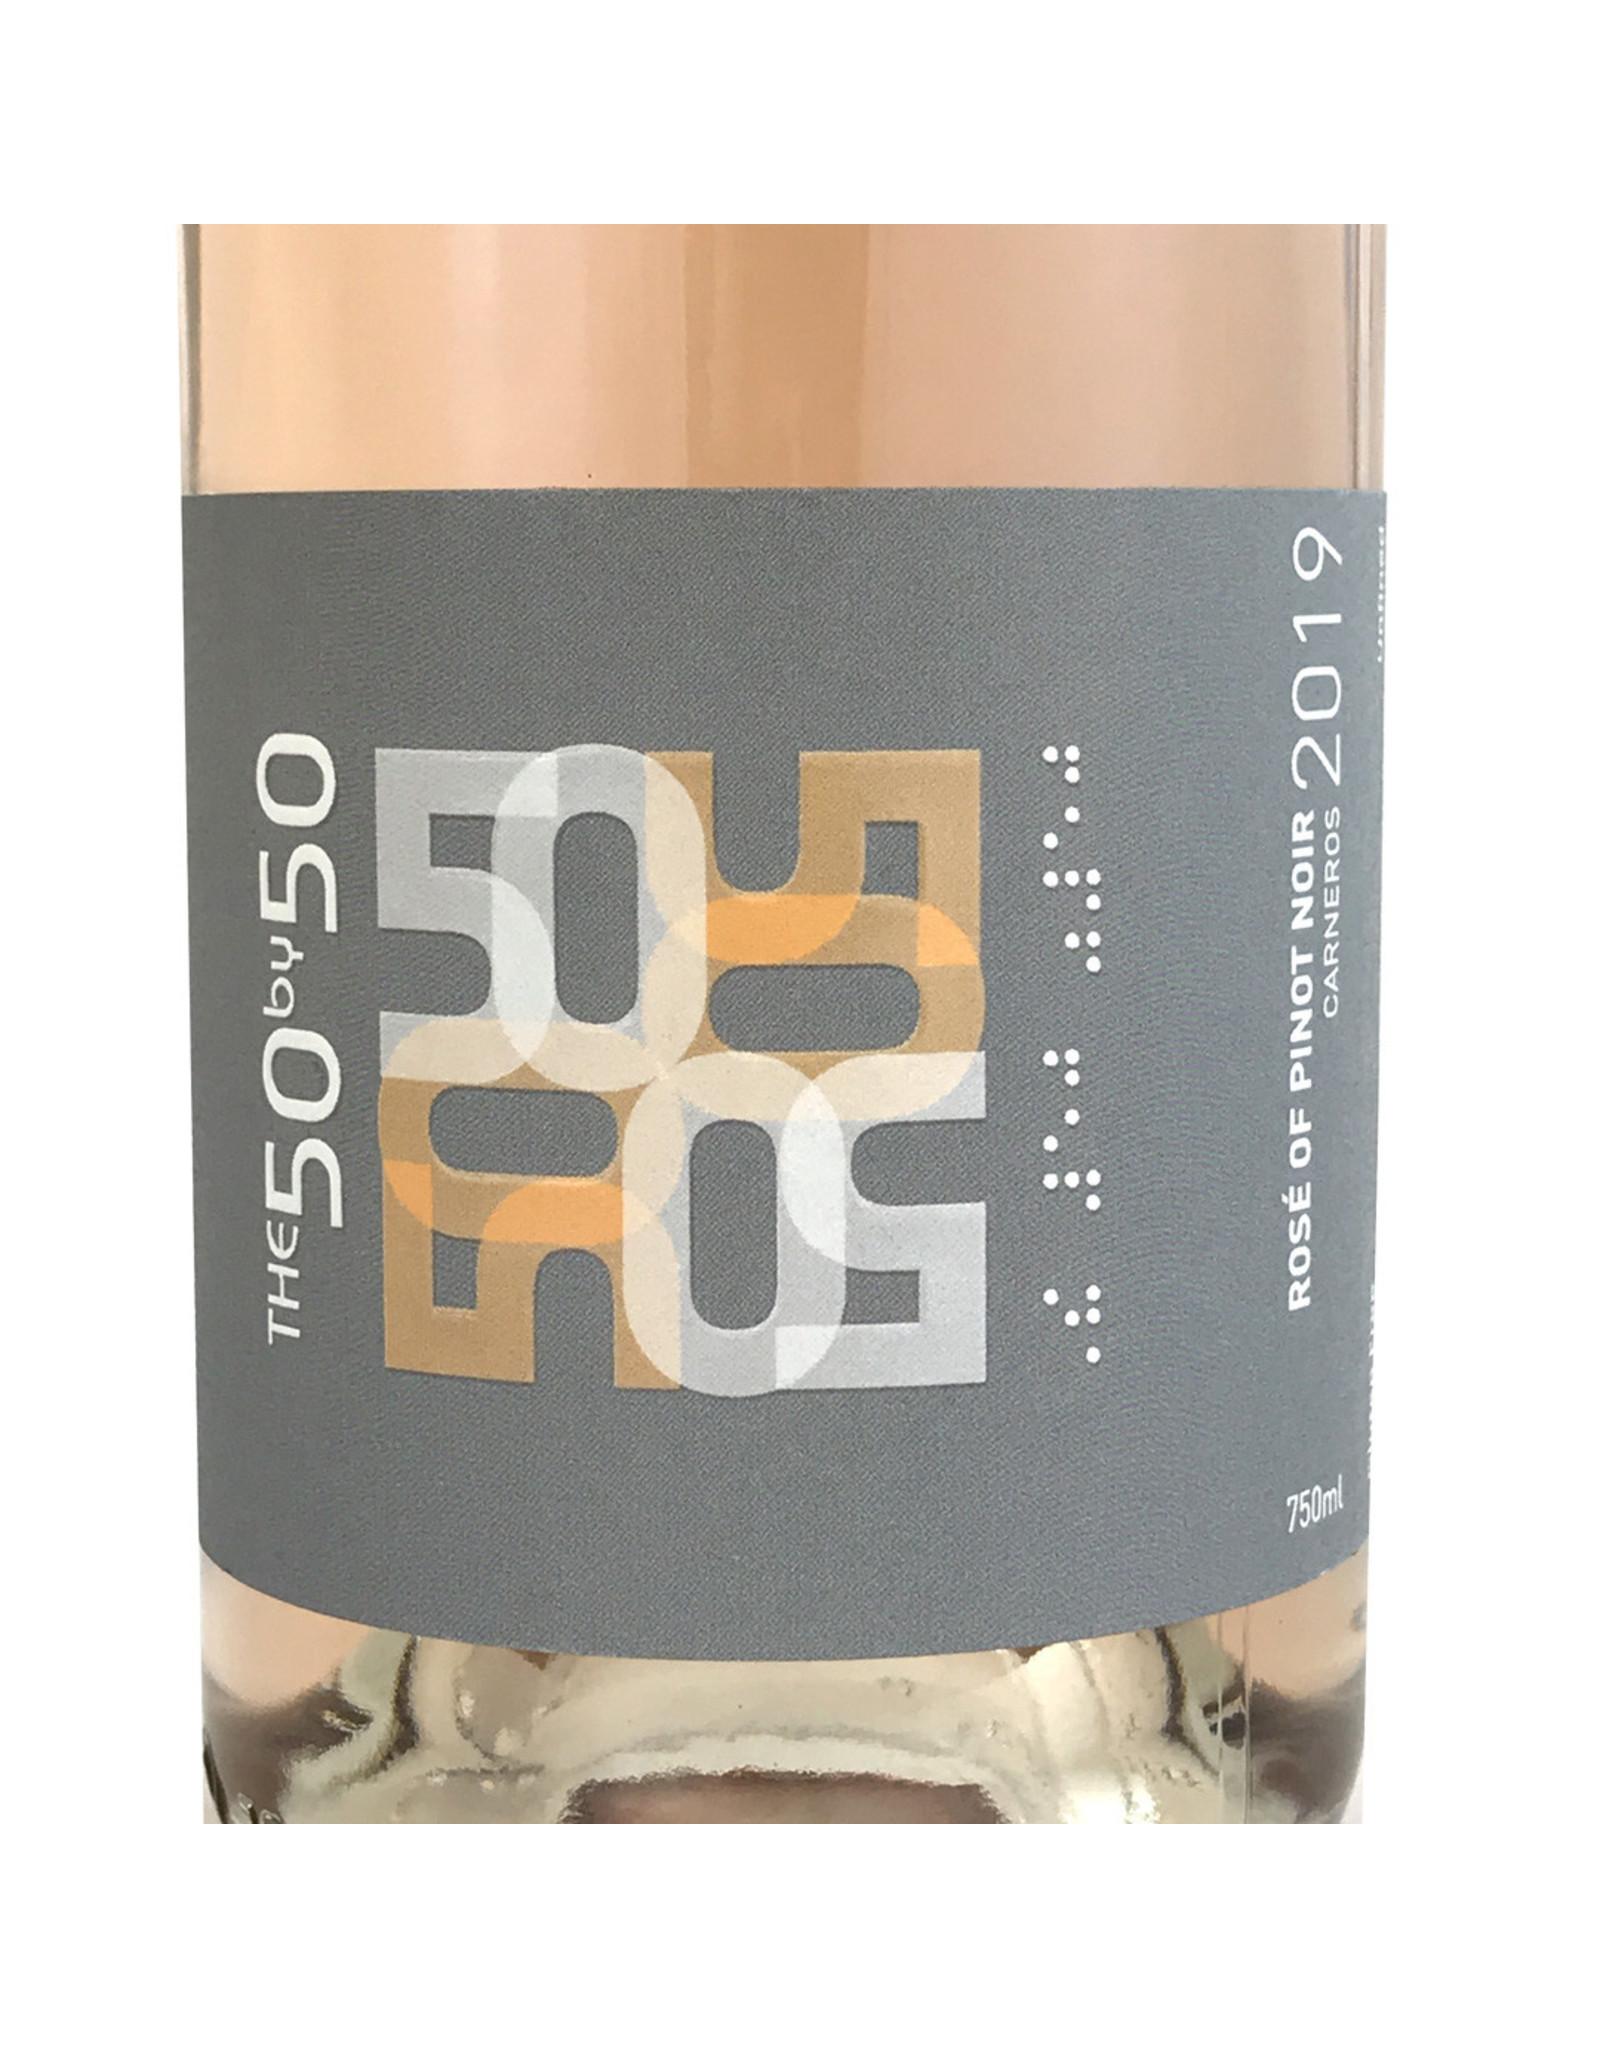 50 by 50 / Devo The 50 by 50 Rose Sonoma Coast 2020